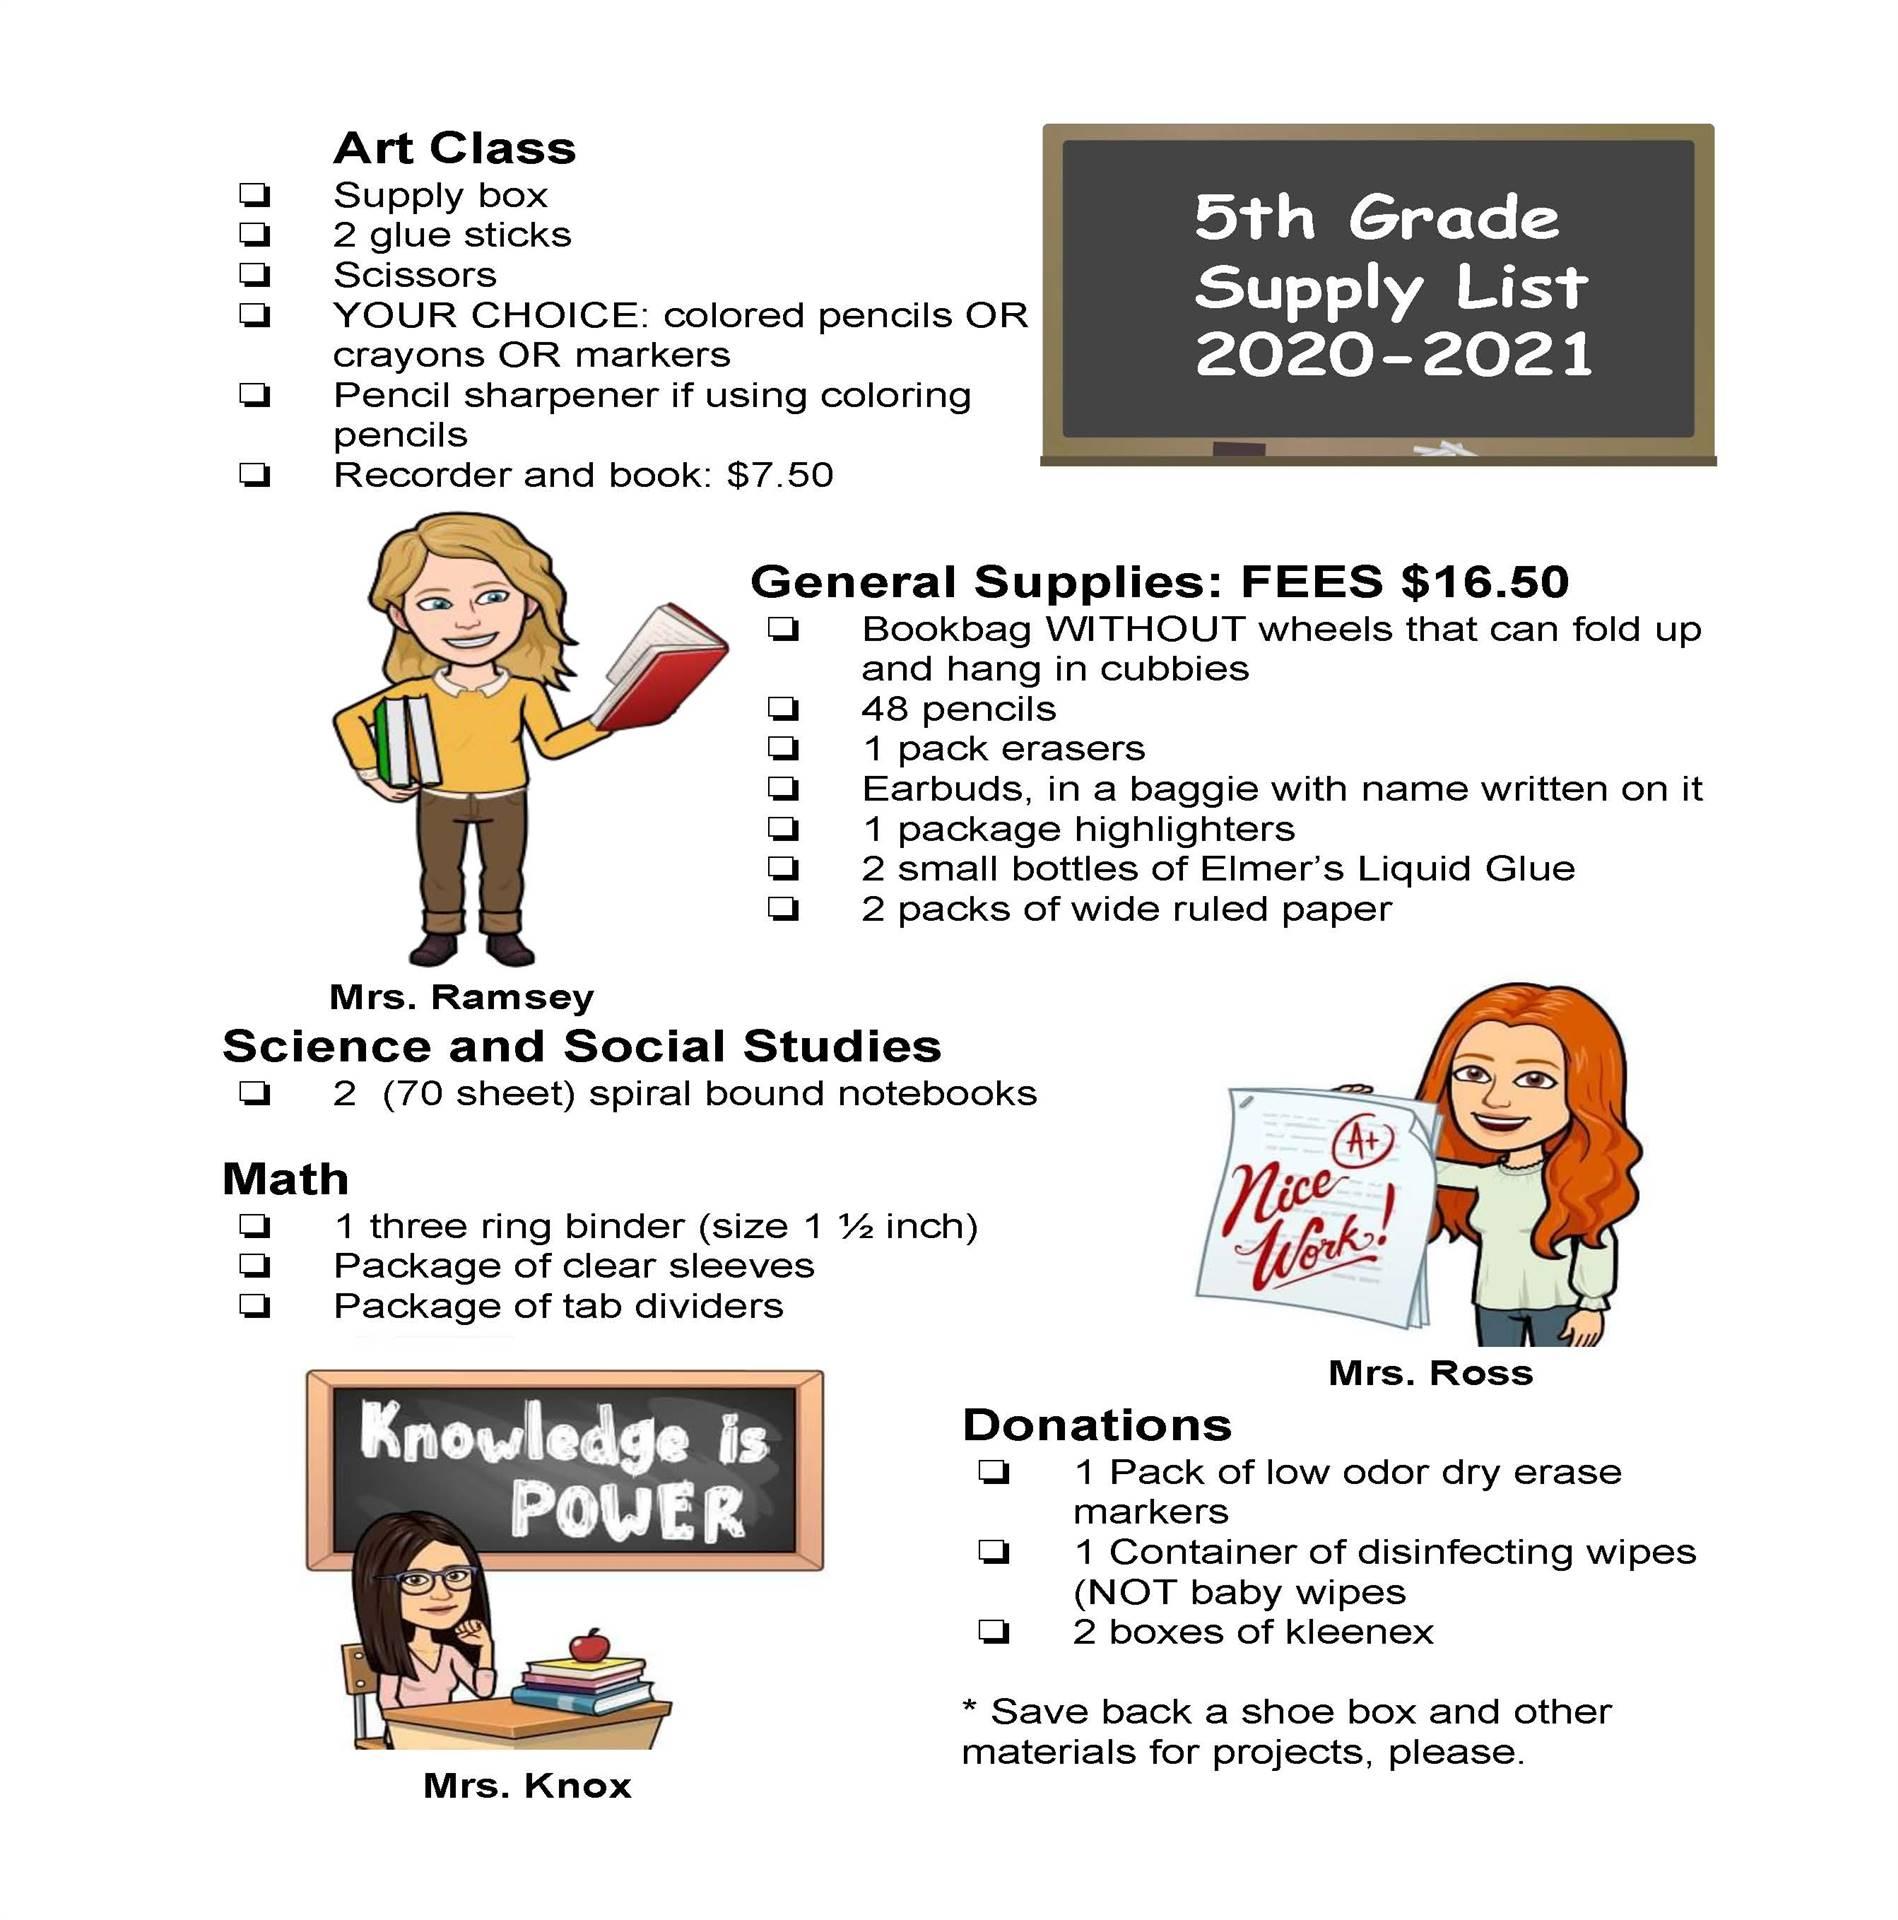 South 5th Grade Supply List